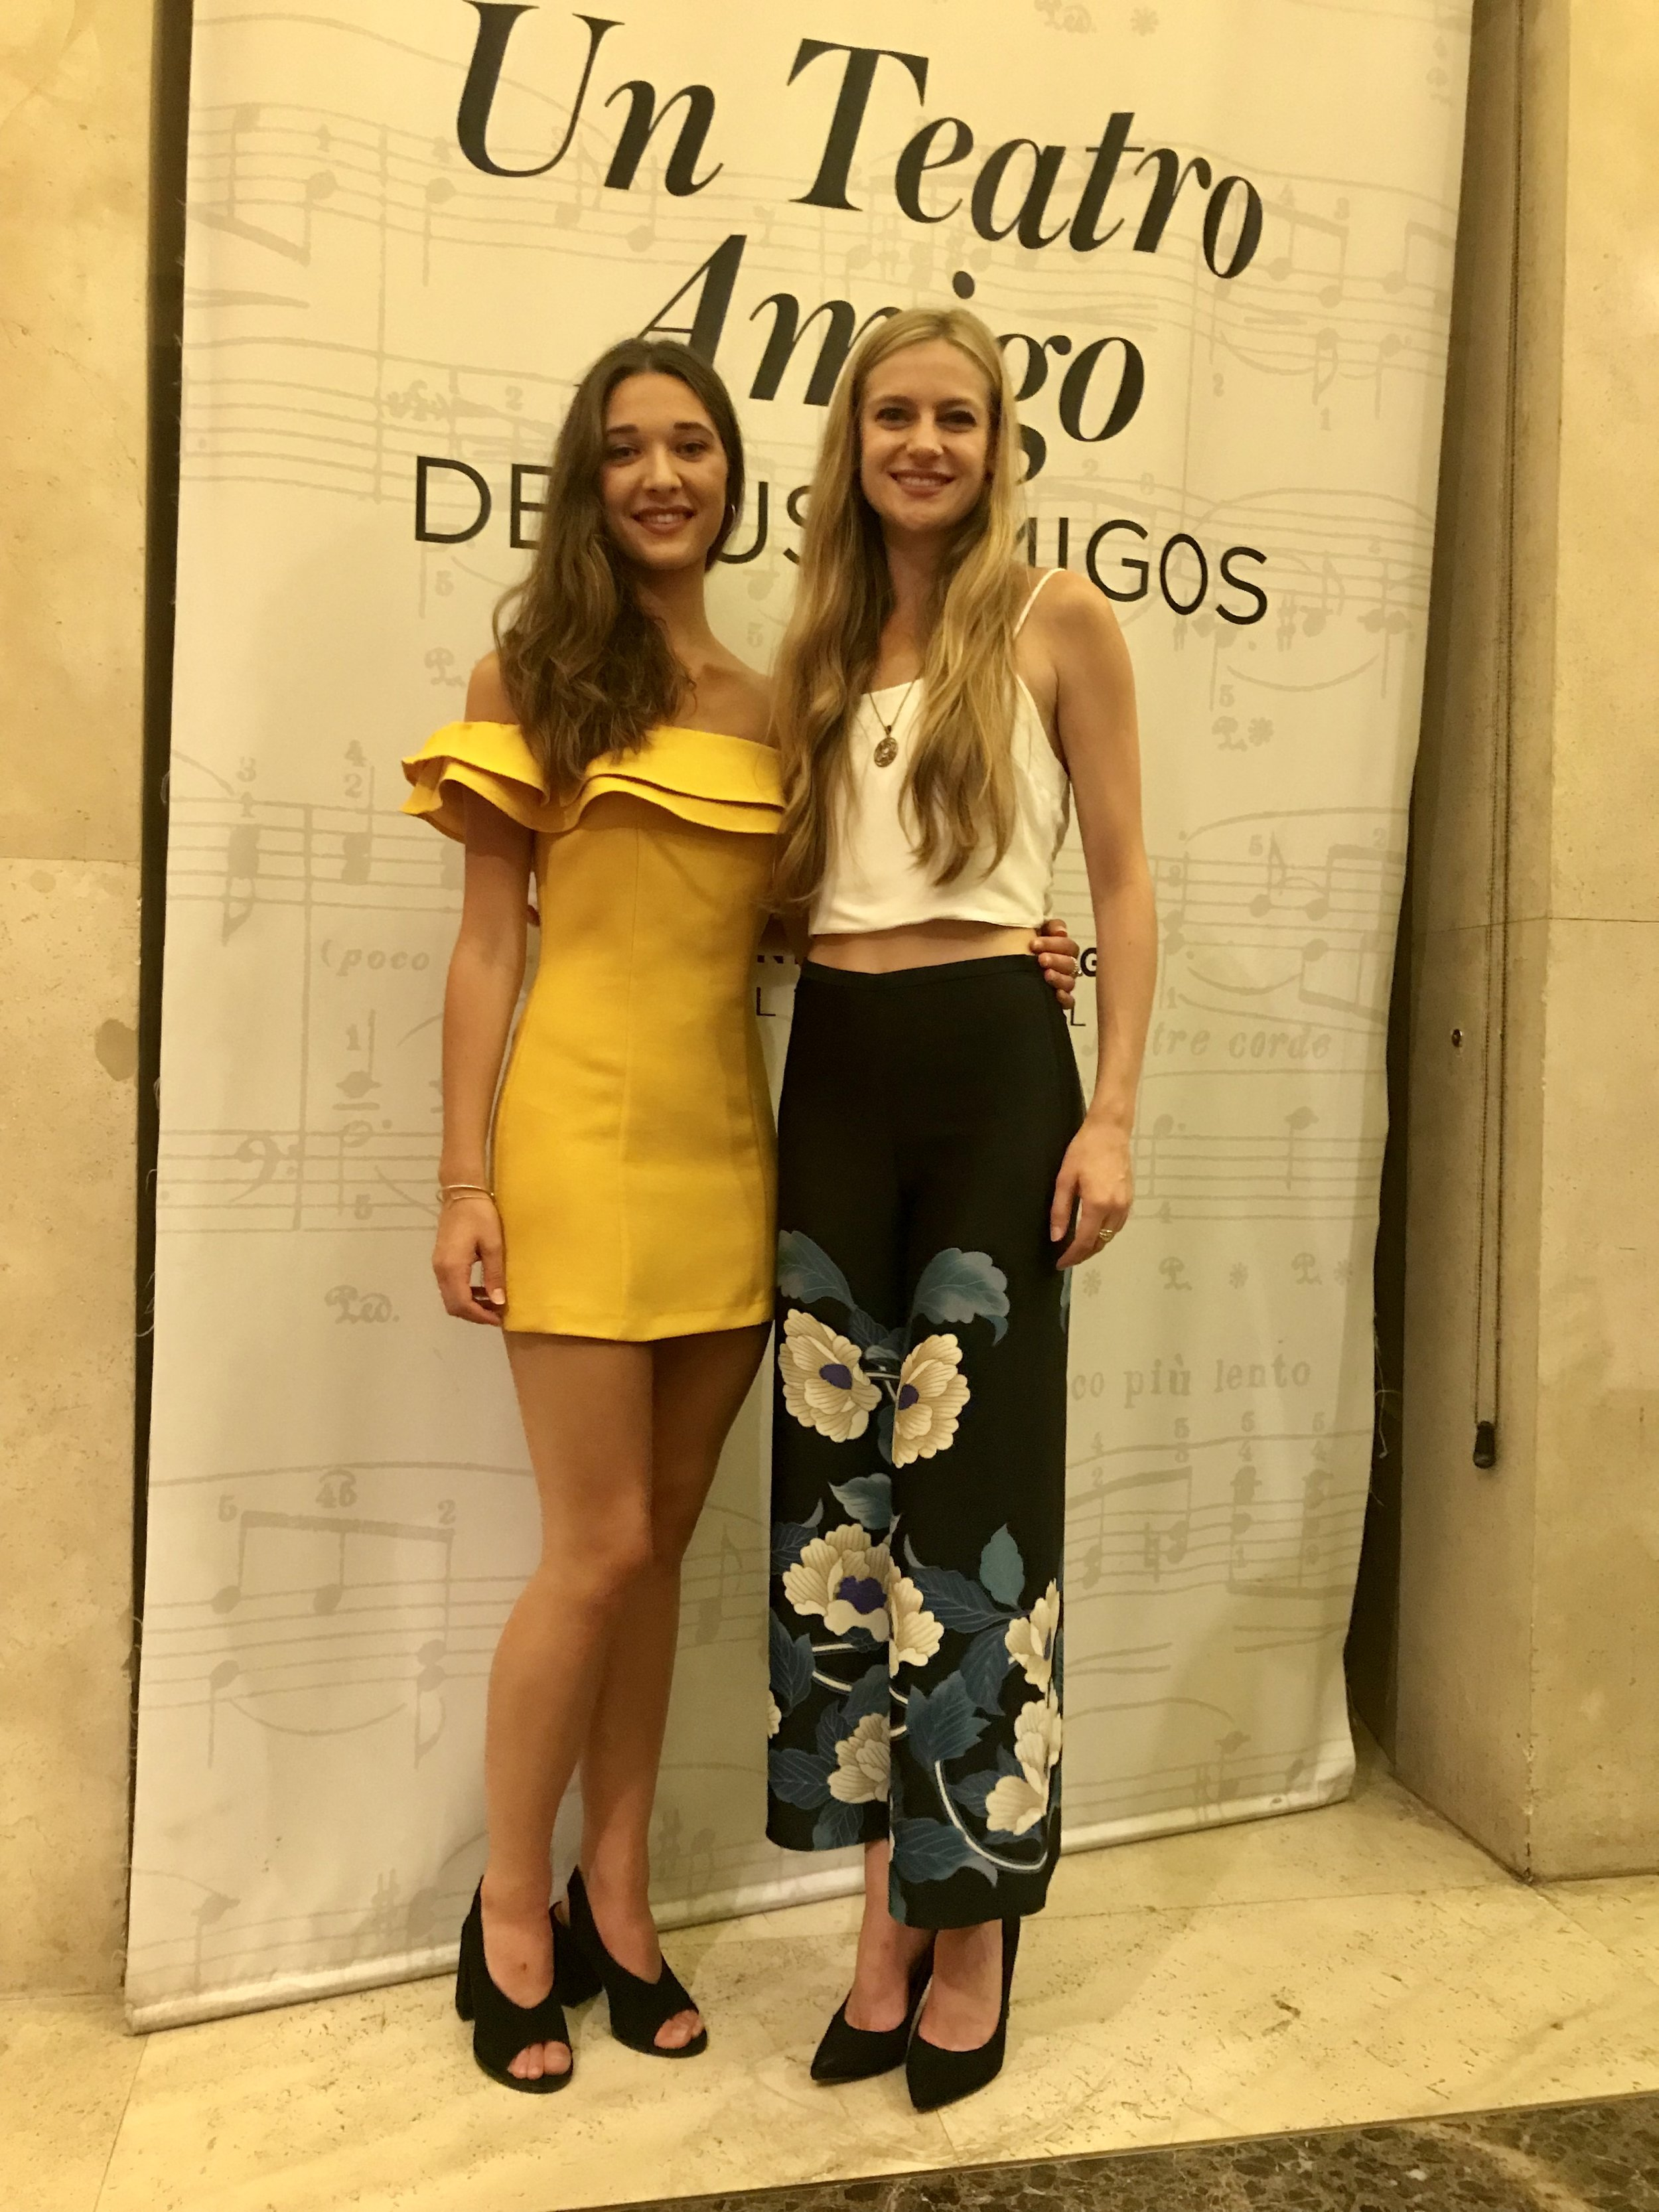 Mica and Julia